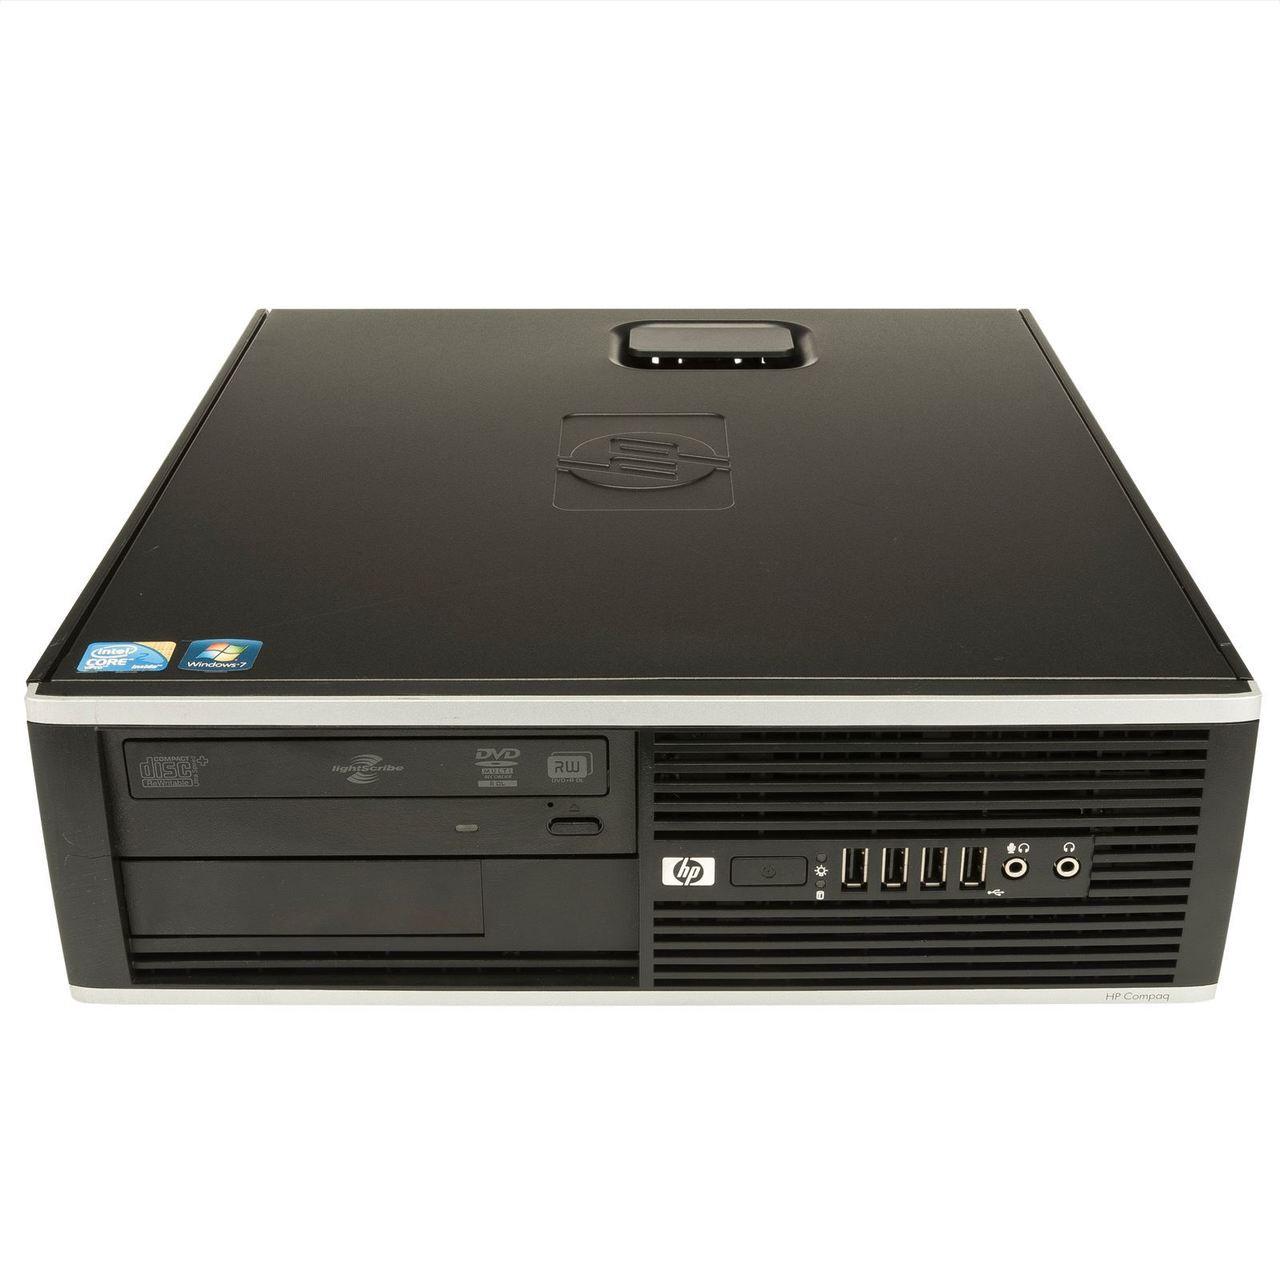 HP Compaq Elite 8000 SFF - Top Display